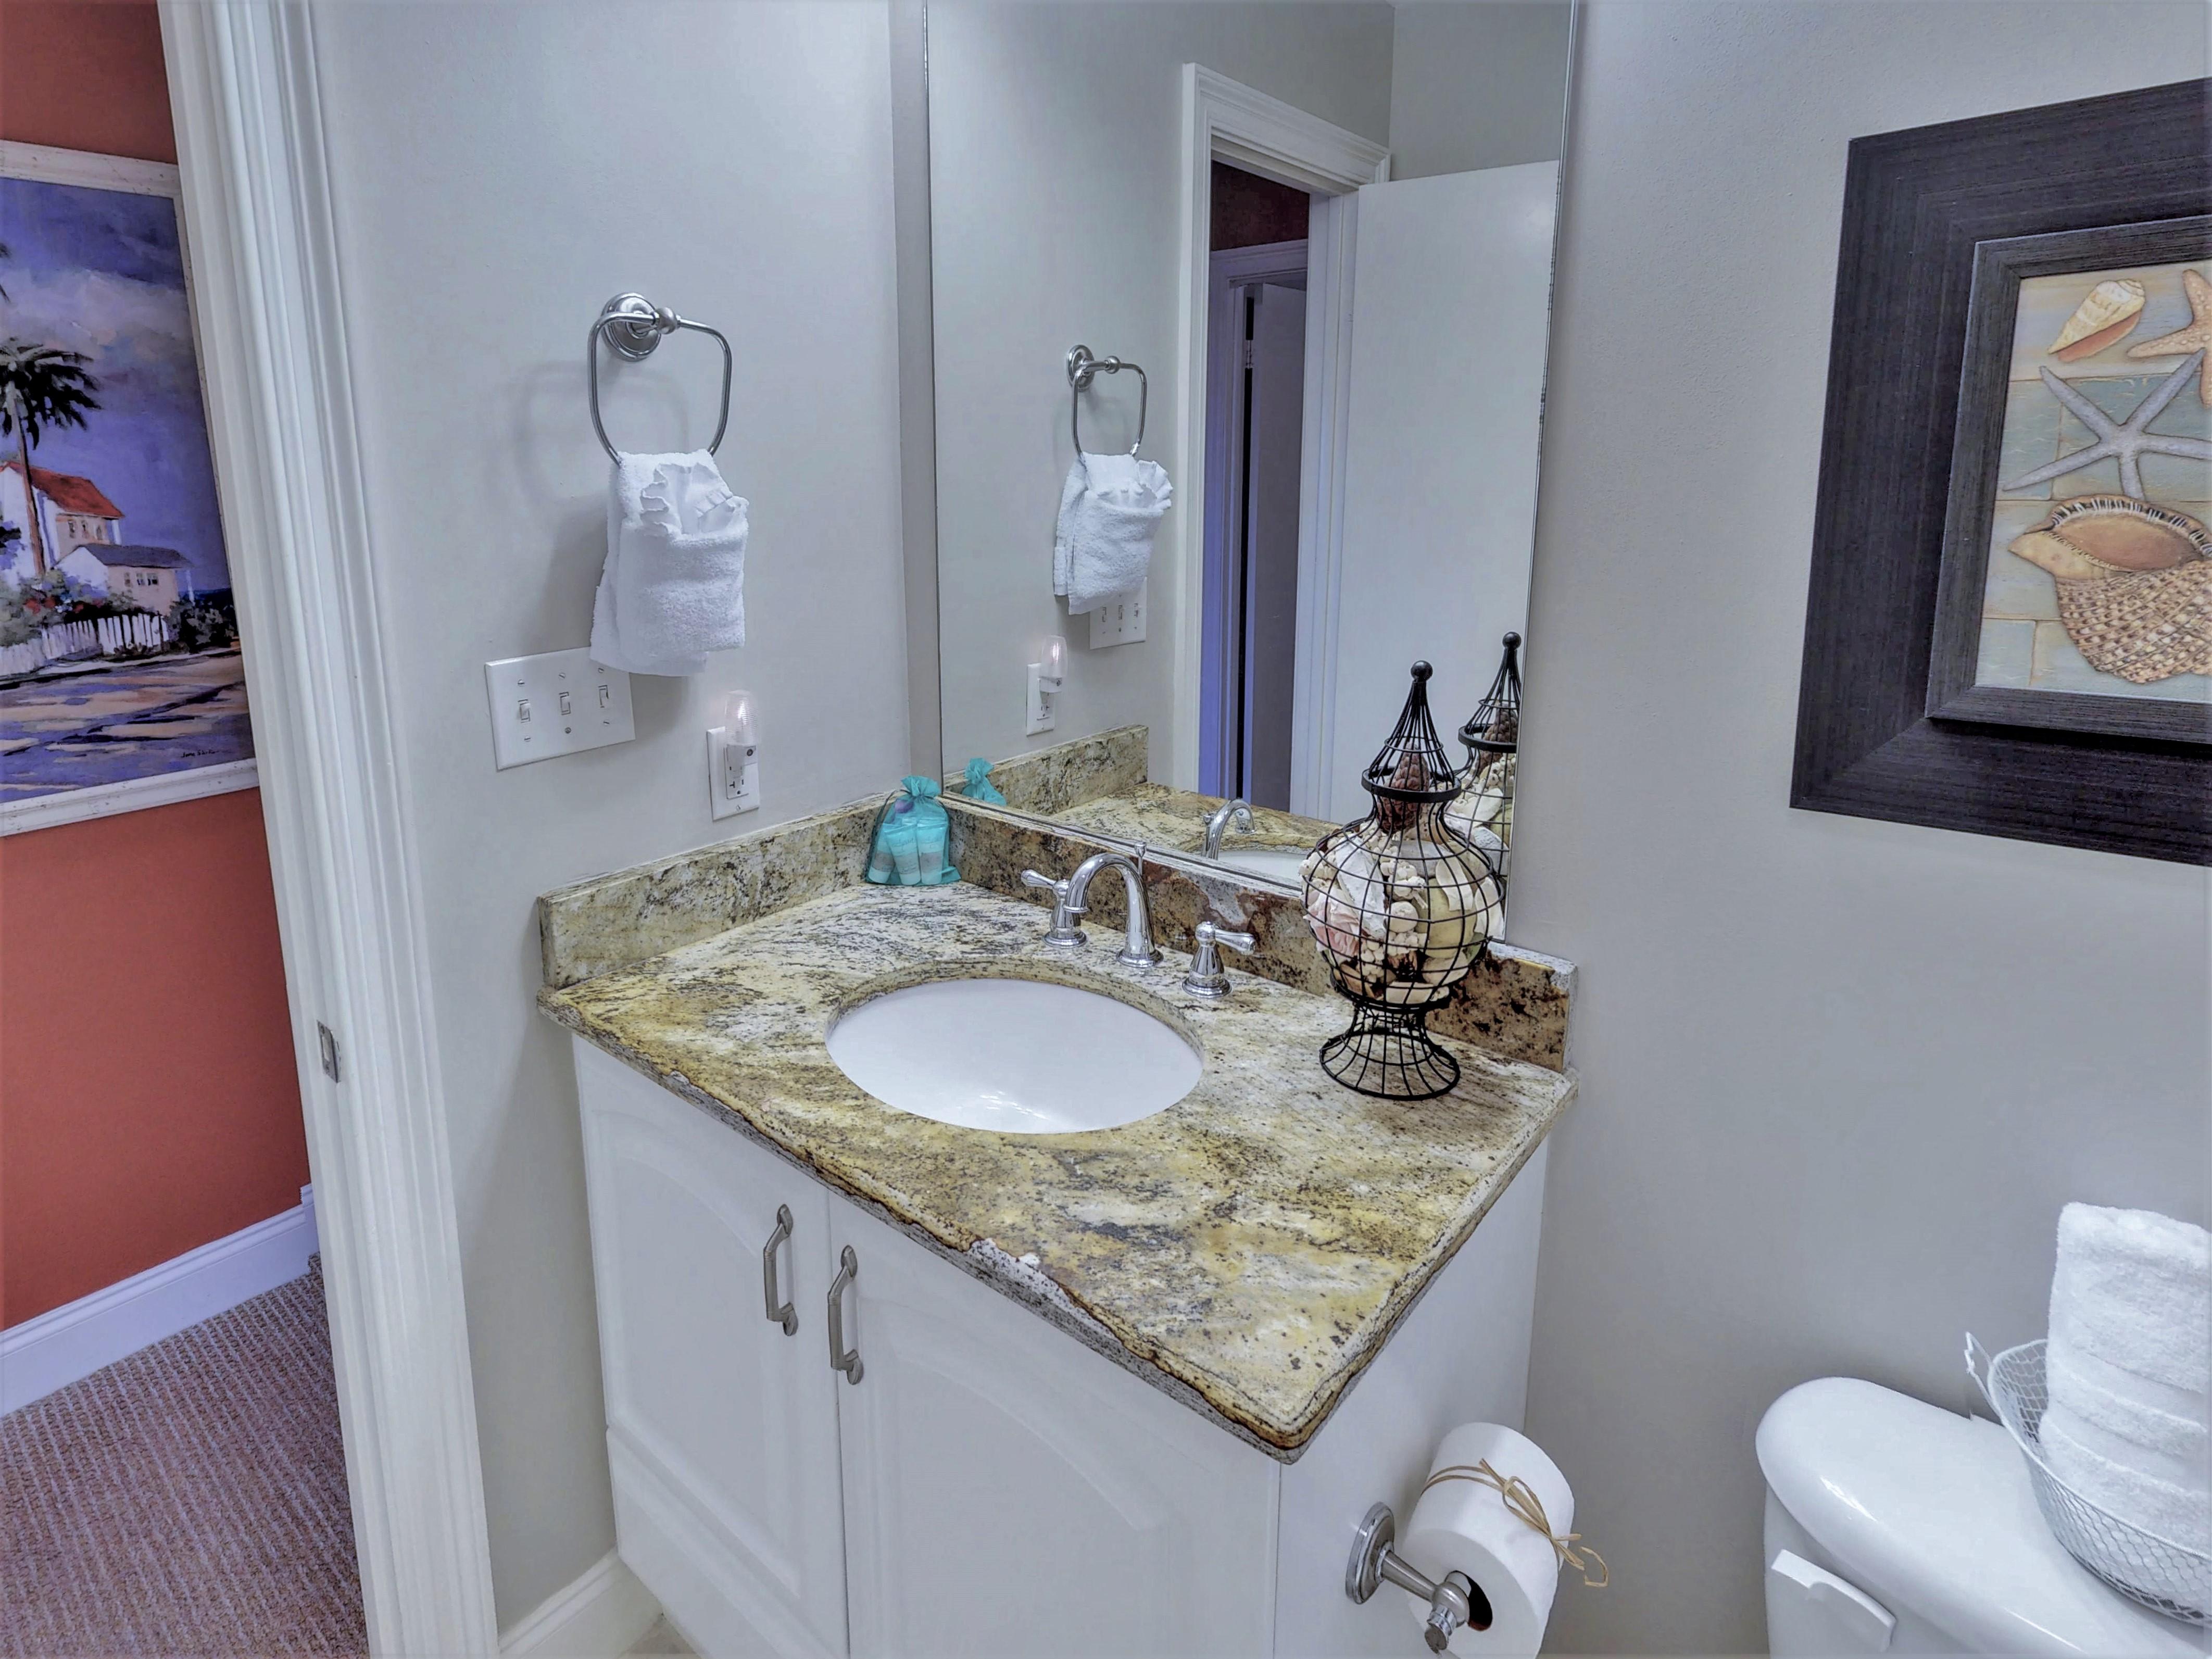 905 Tops'l Beach Manor Condo rental in TOPS'L Beach Manor  in Destin Florida - #18